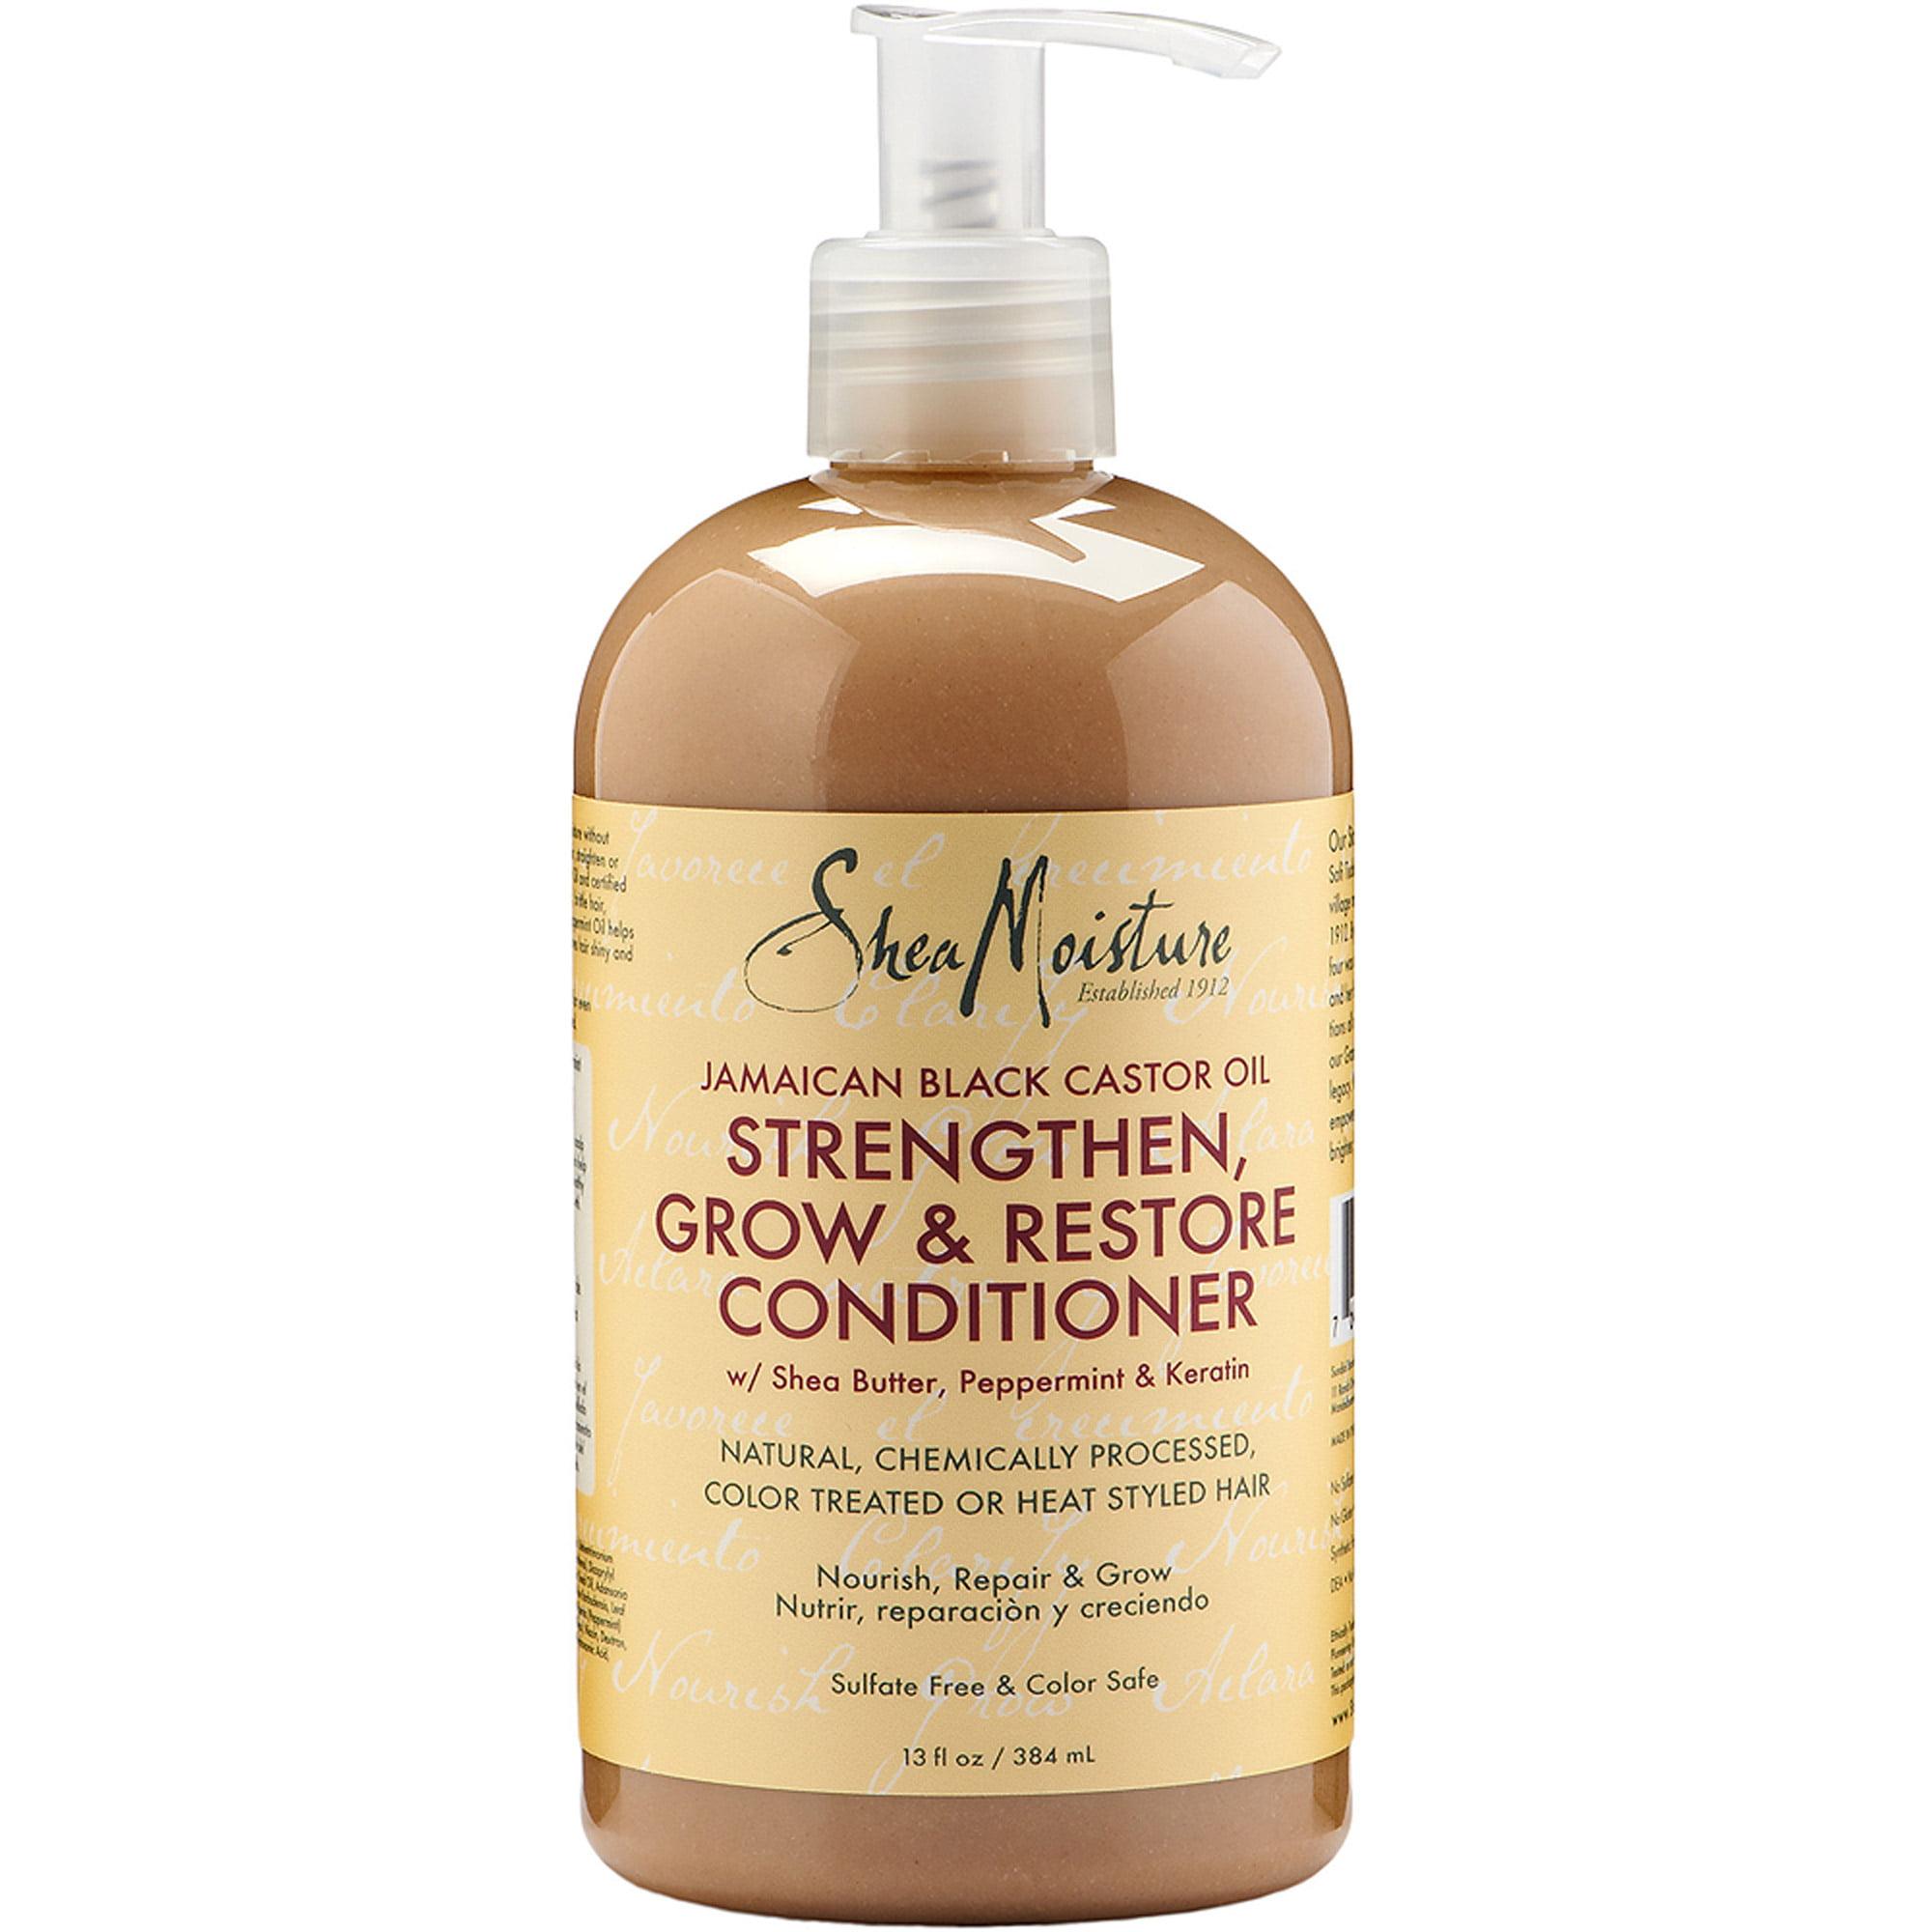 SheaMoisture Jamaican Black Castor Oil Strengthen, Grow & Restore Conditioner, 13 fl oz